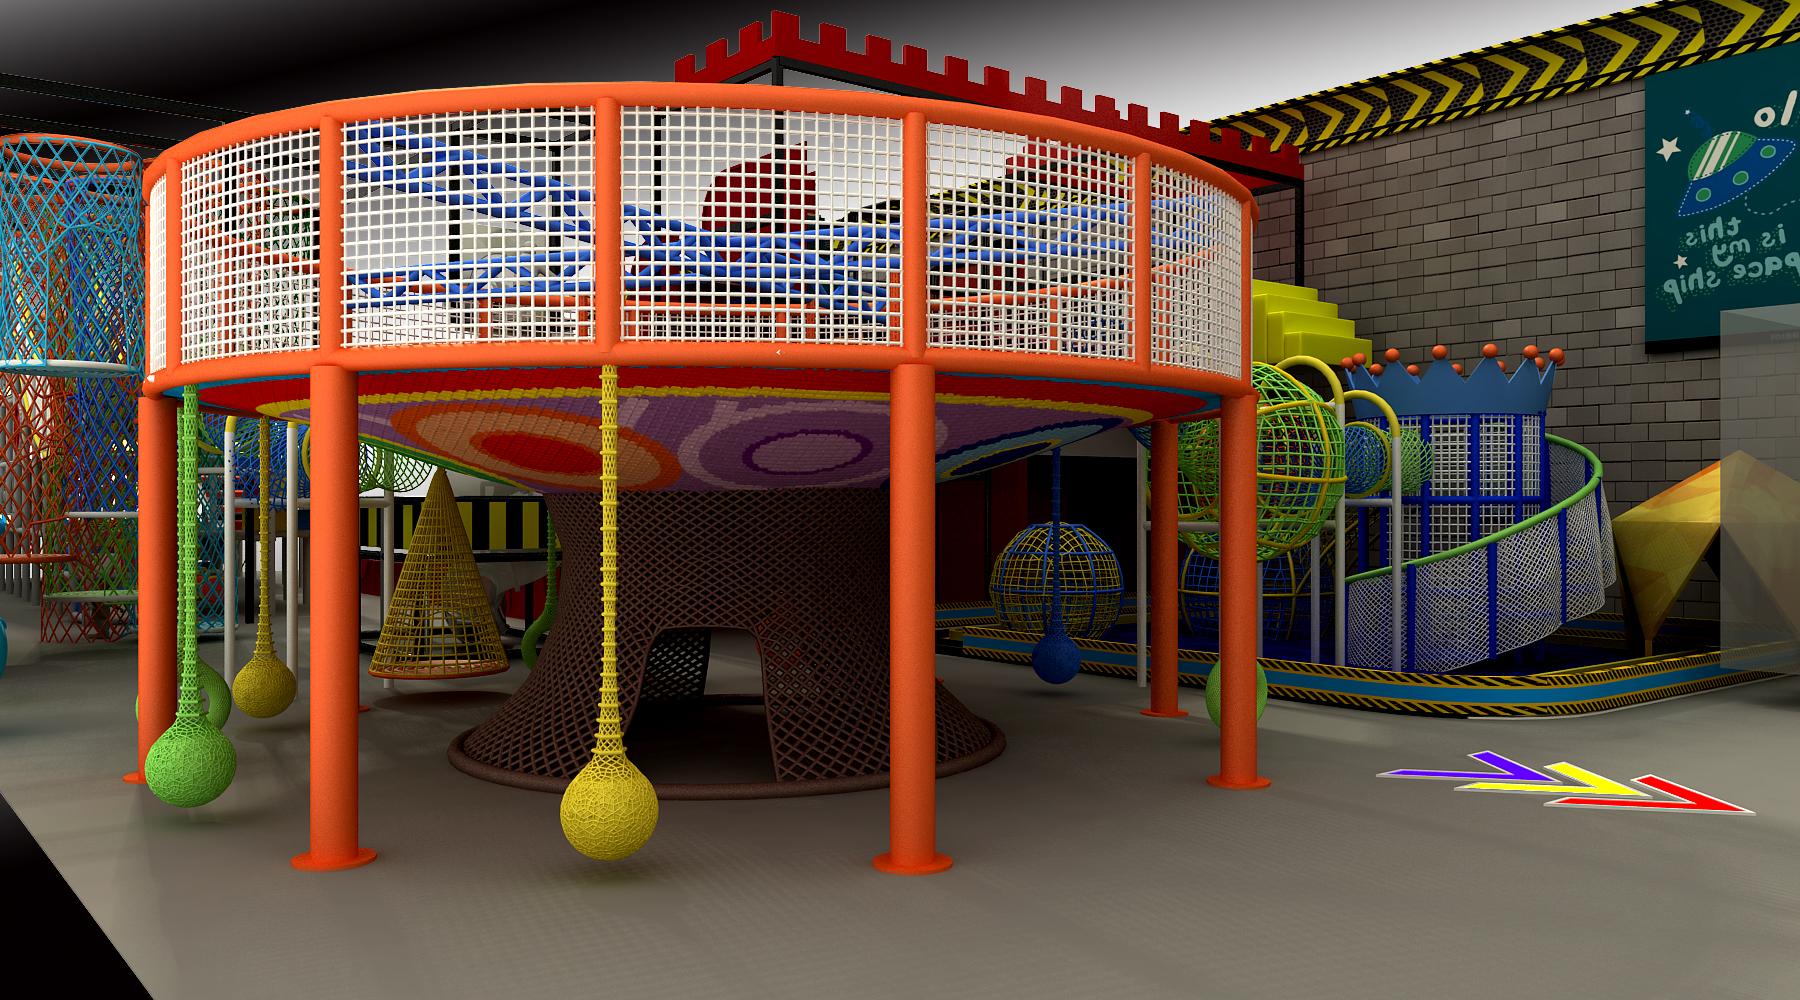 Canada indoor big slide, devil slide, rainbow slide~